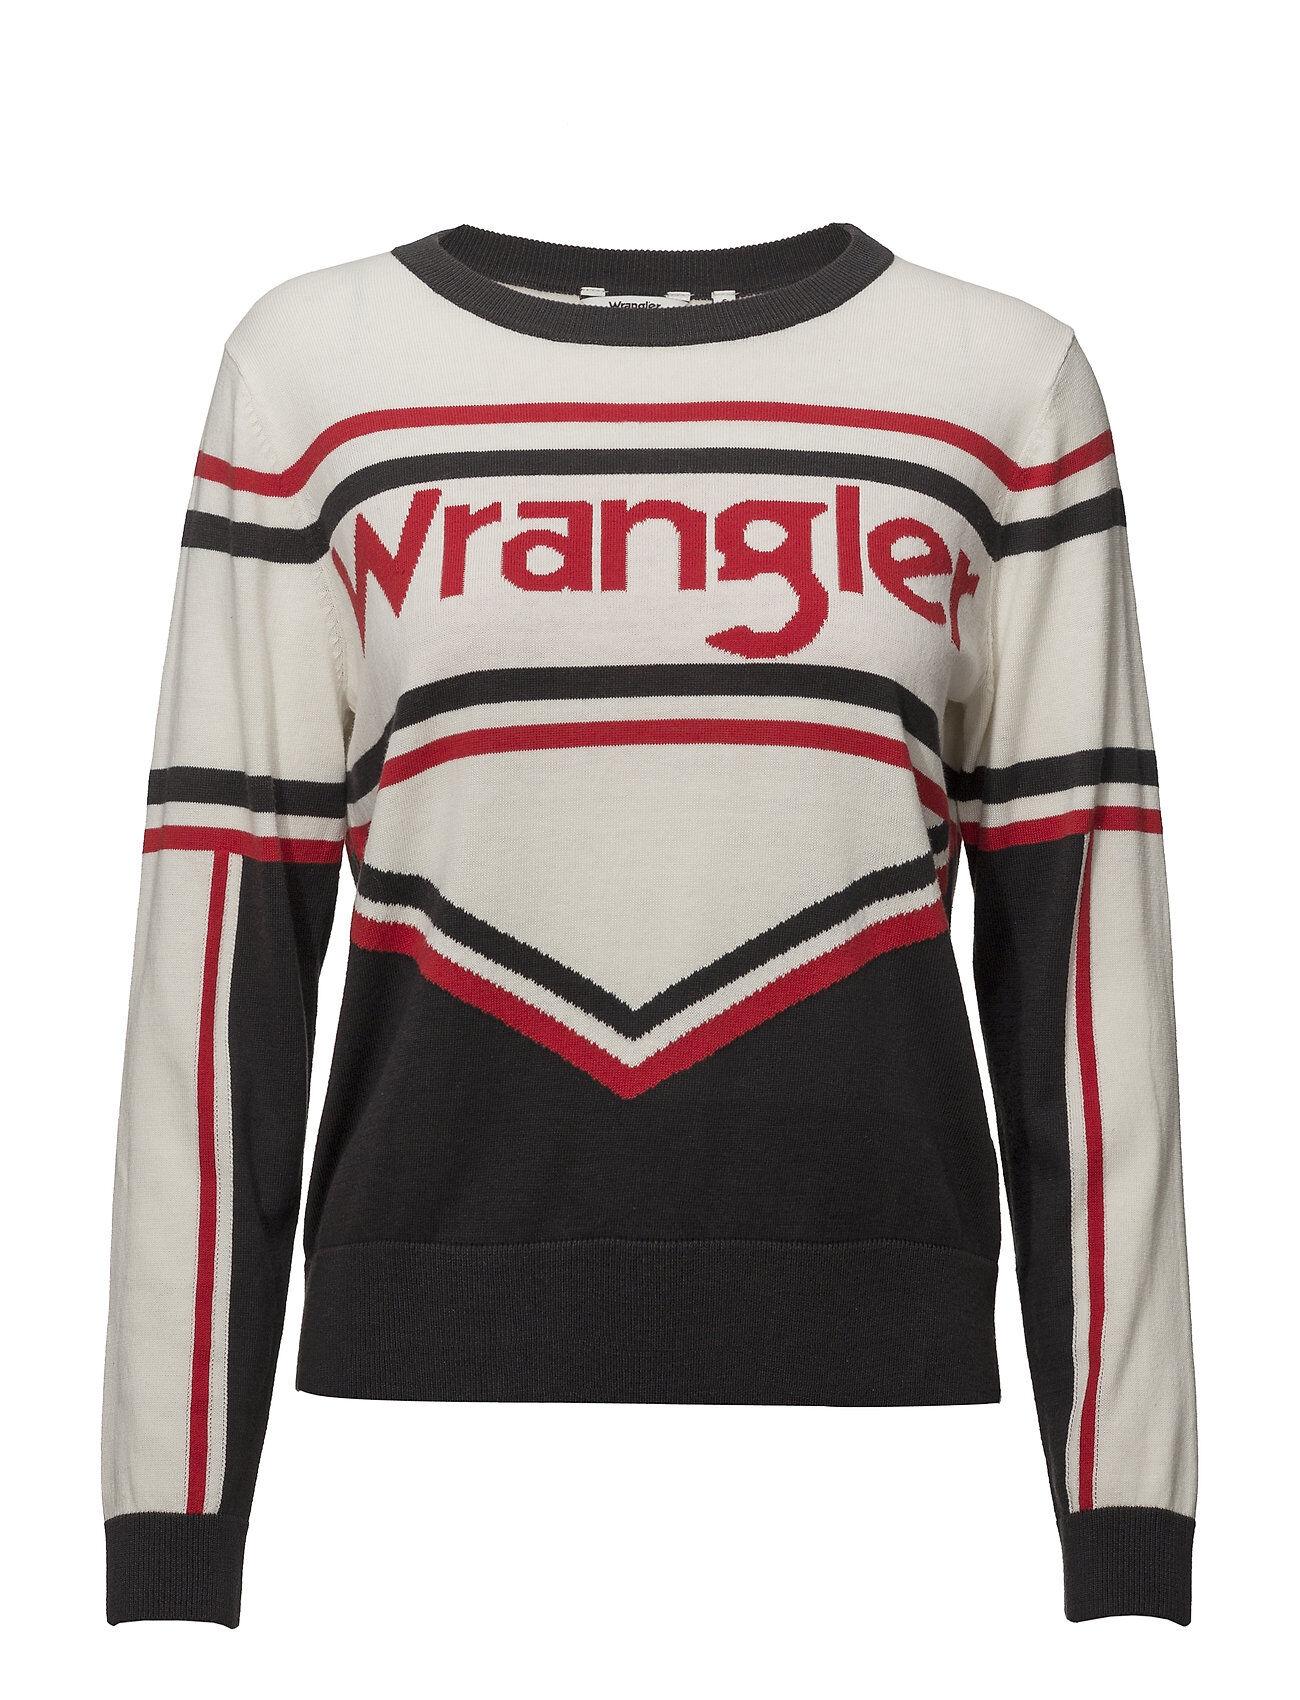 Wrangler Cheer Knit Shirt